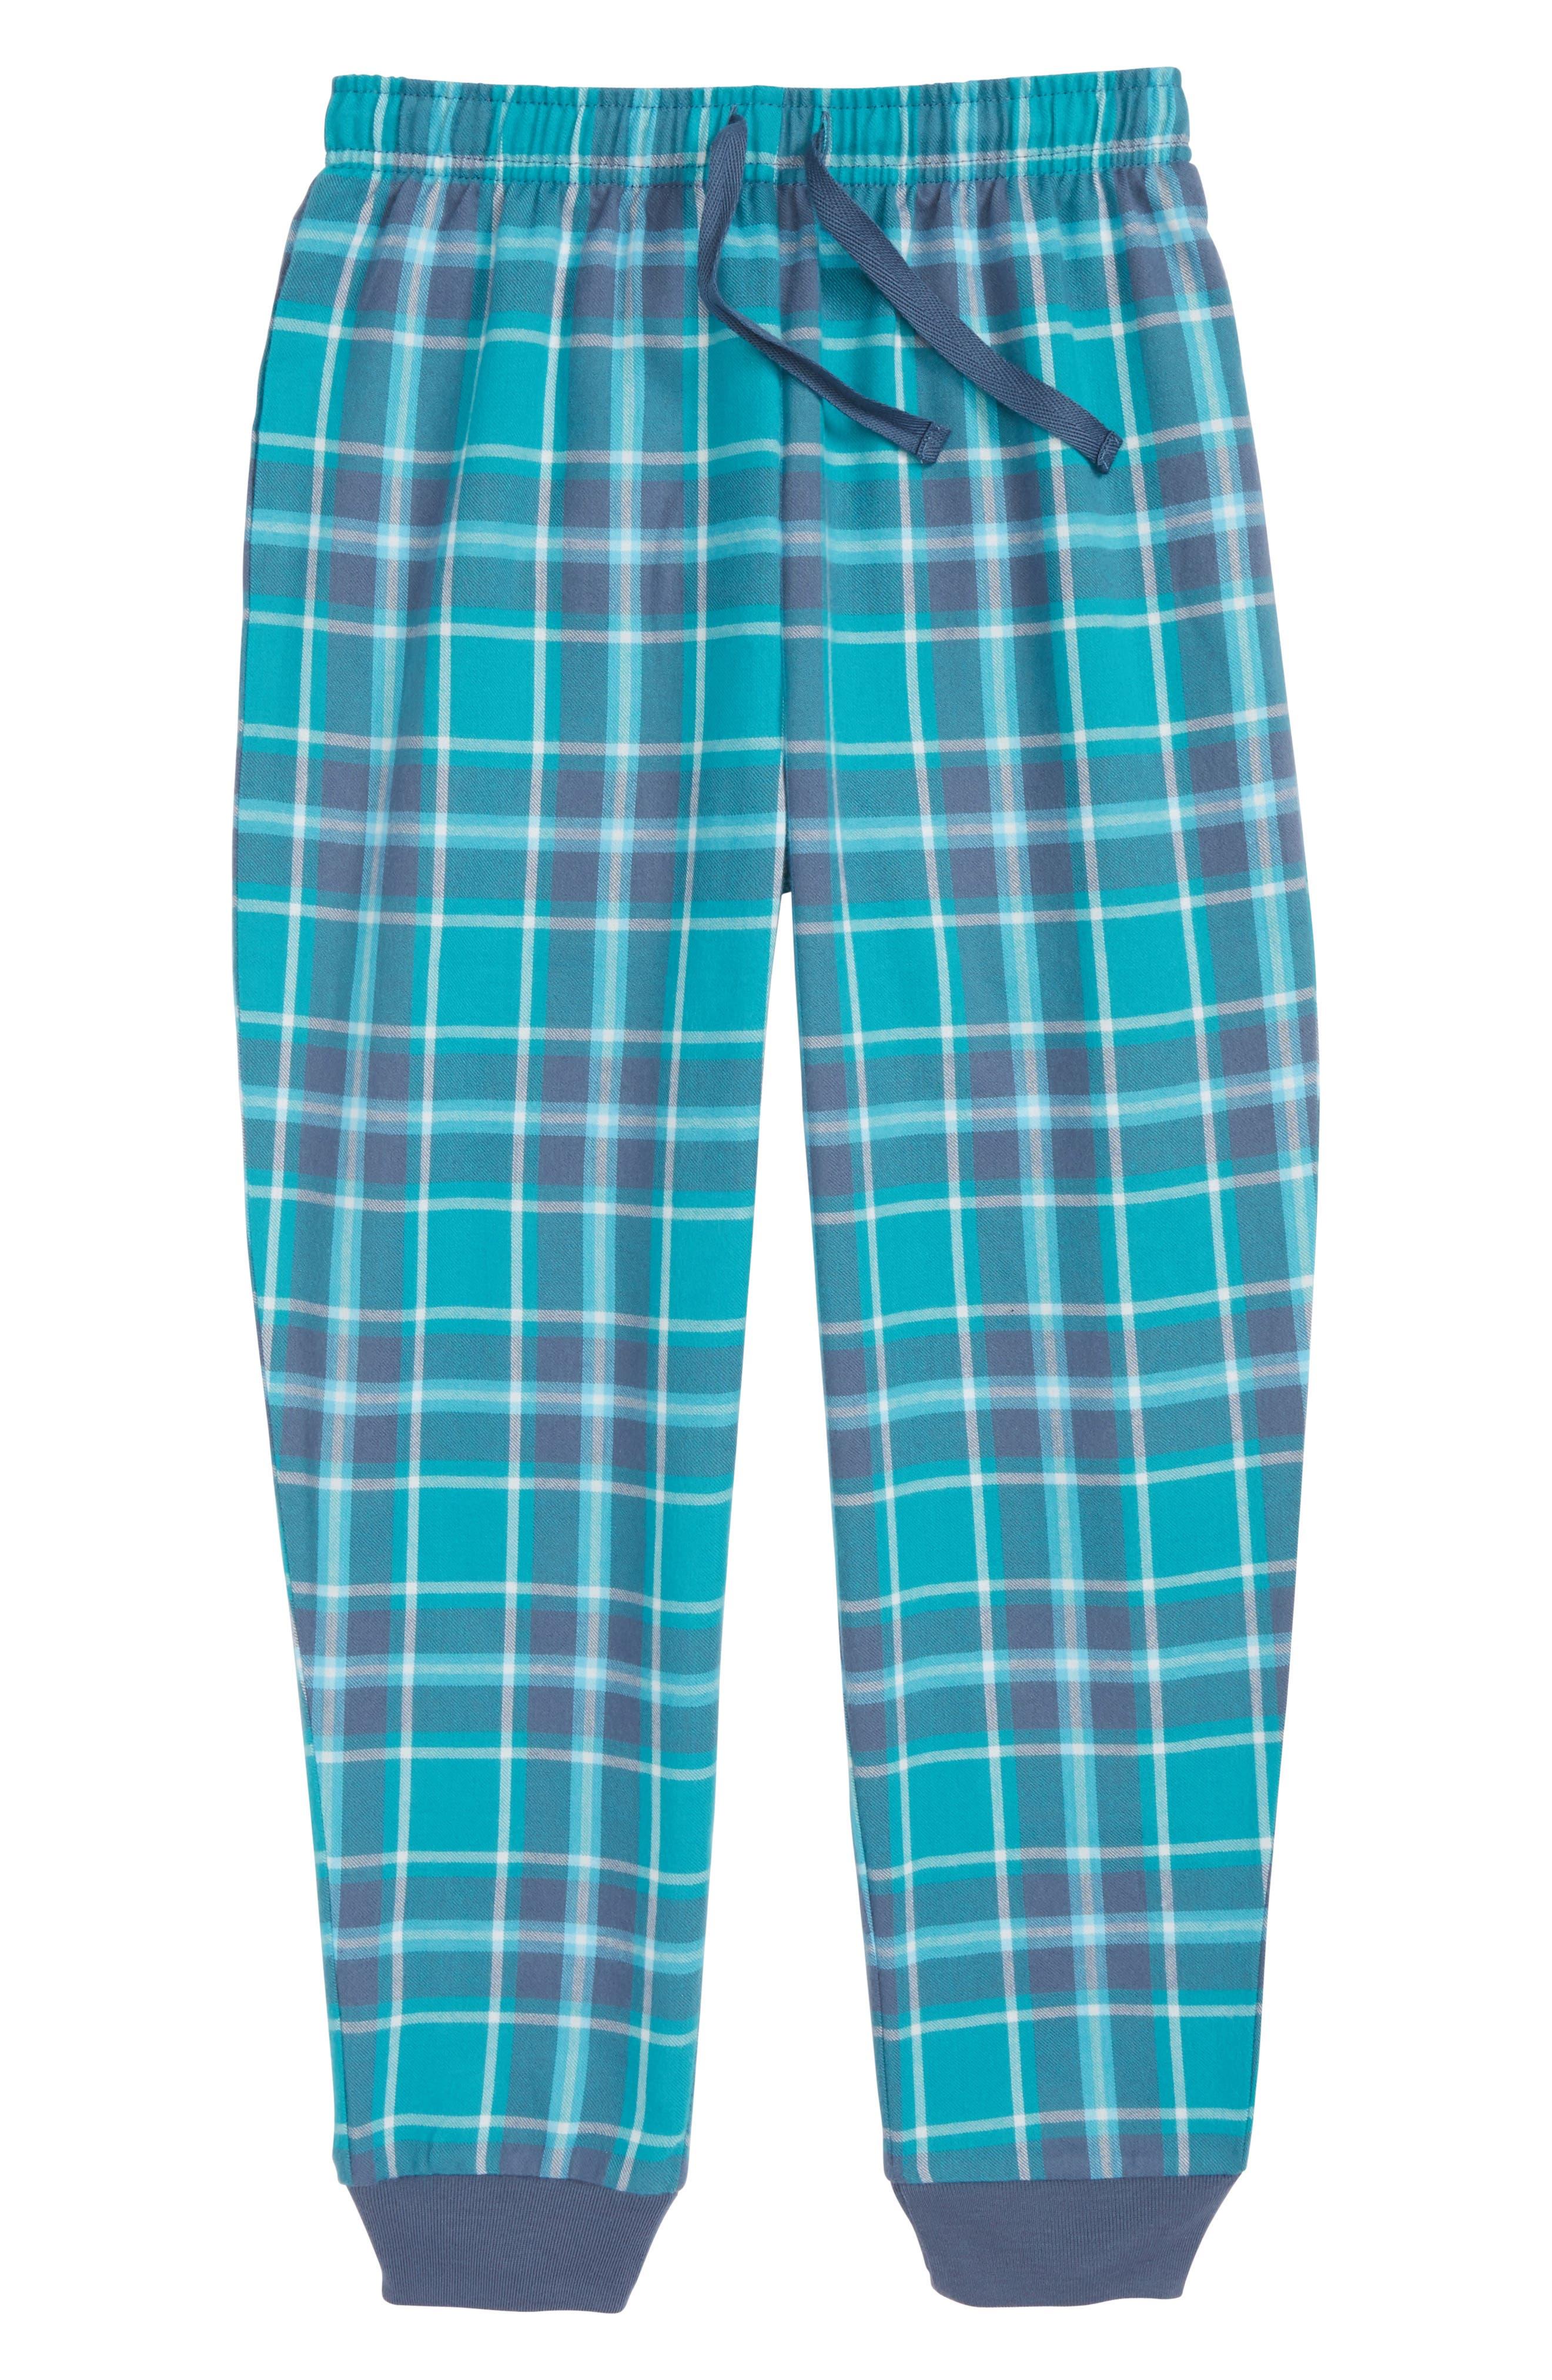 Flannel Jogger Pants,                             Main thumbnail 1, color,                             415